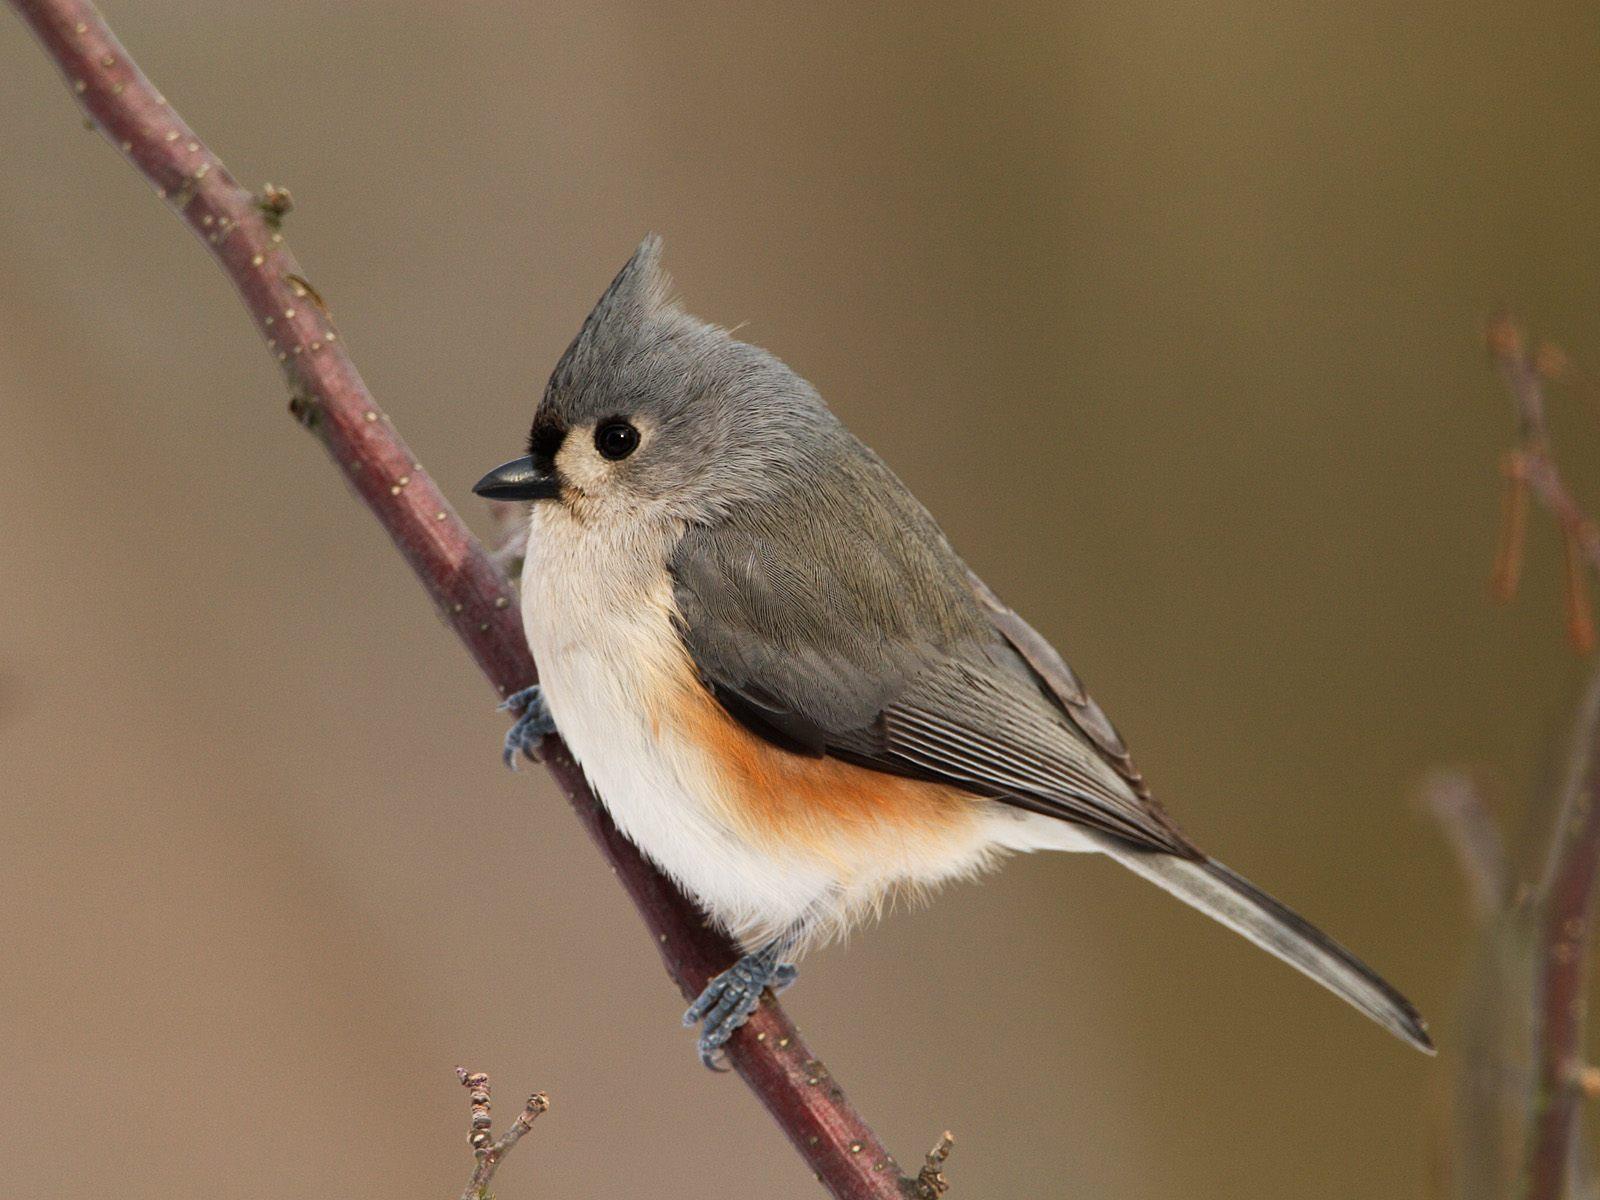 BEAUTIFUL WILD ANIMALS: Birds Wallpaper